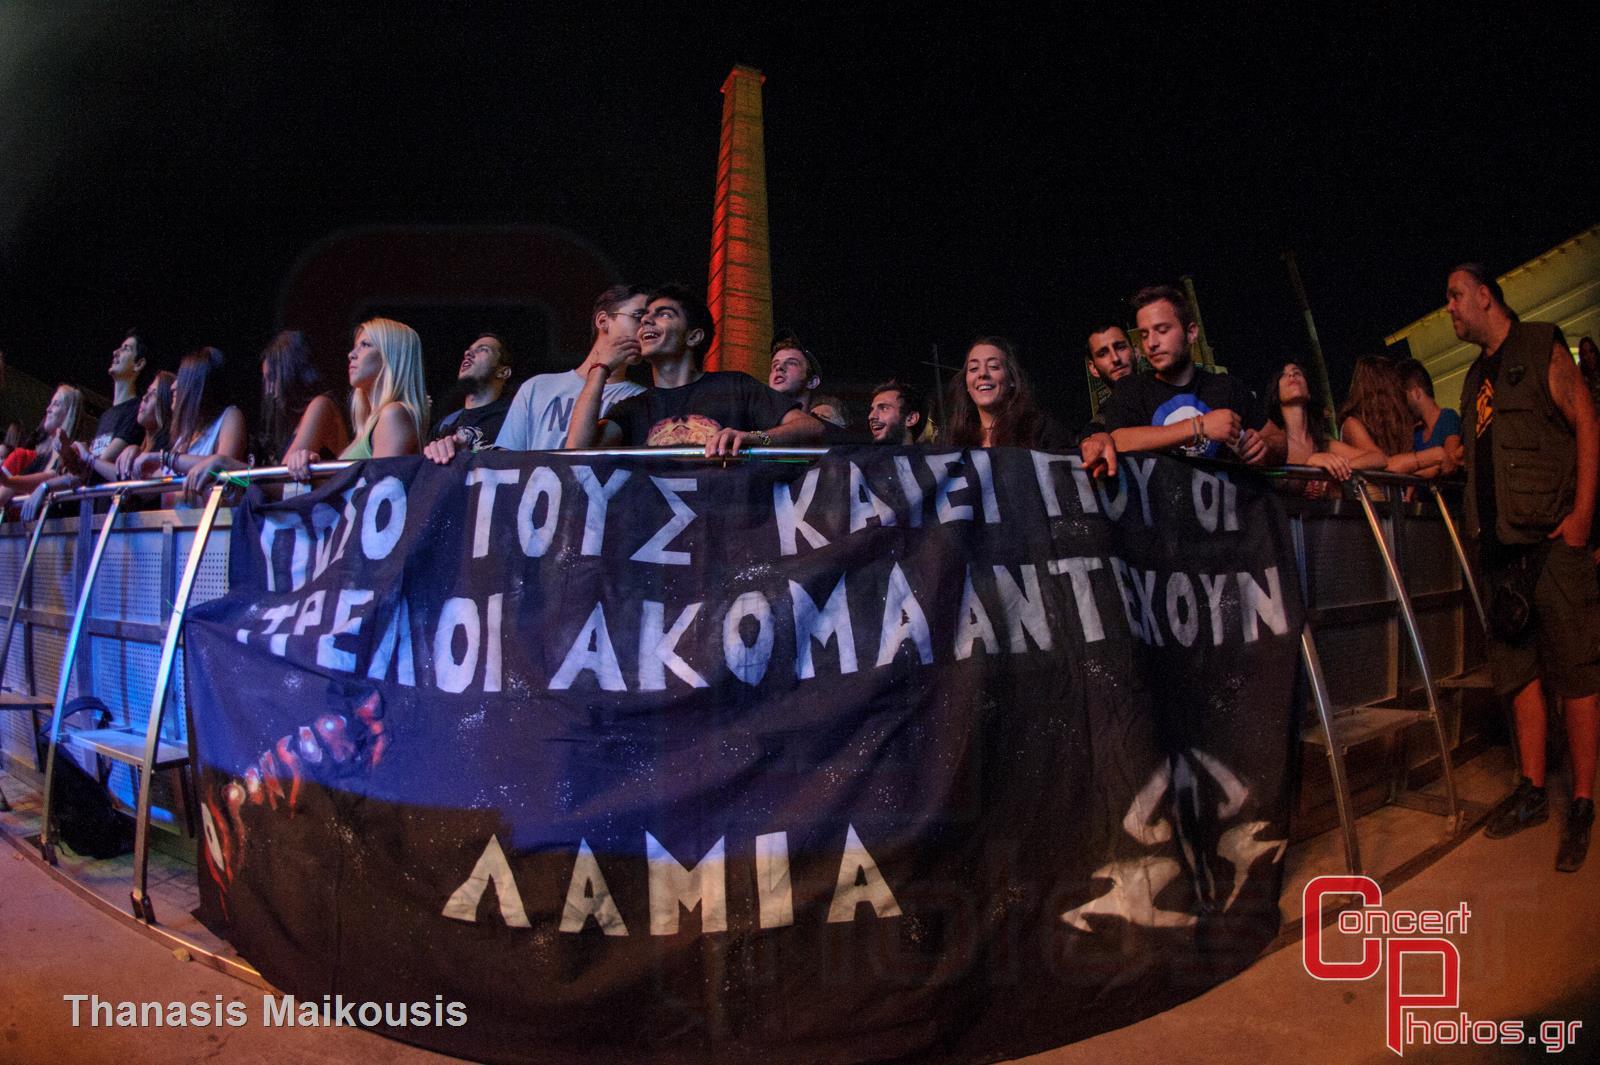 Active Member - Τραγούδα μας να φύγει το σκοτάδι- photographer: Thanasis Maikousis - concertphotos_-4931